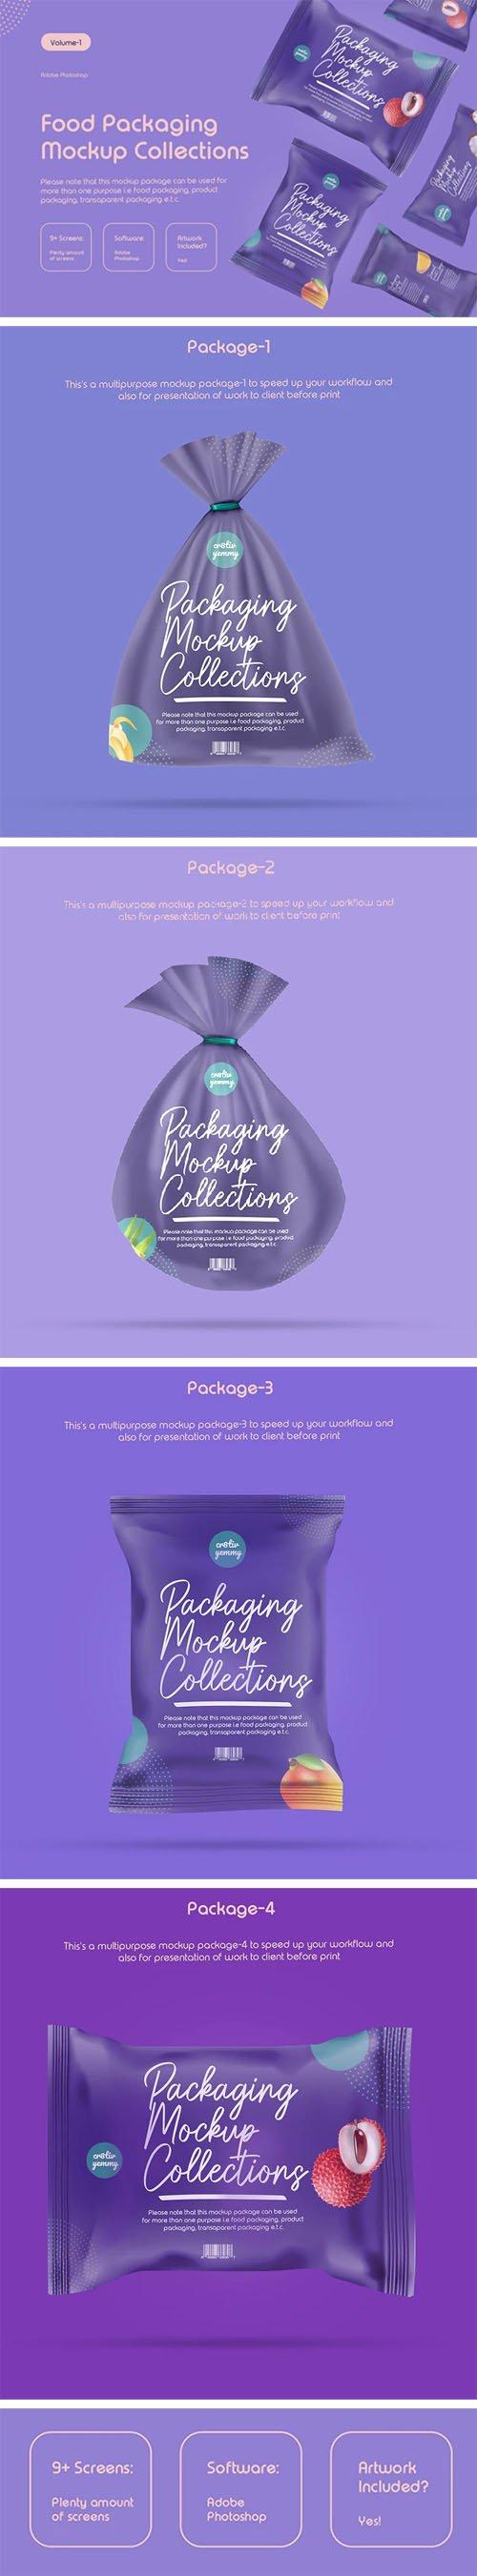 10 Food Packaging PSD Mockups Templates